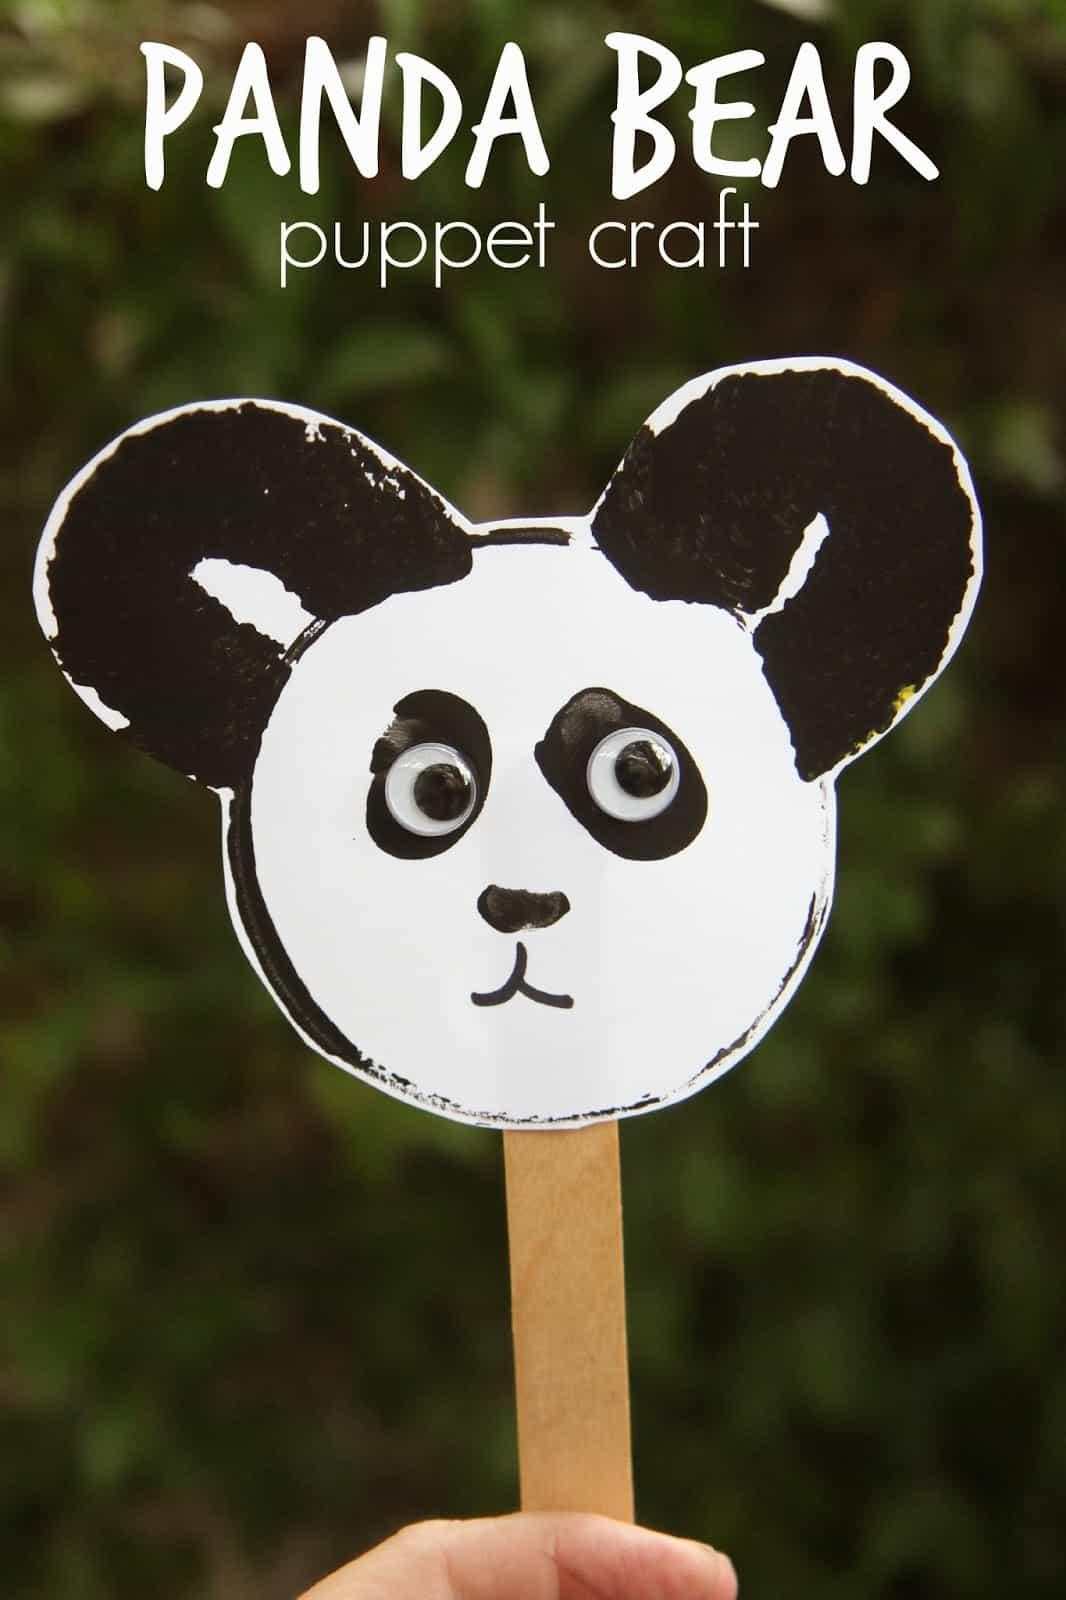 Panda Bear Puppet Craft Toddler Approved